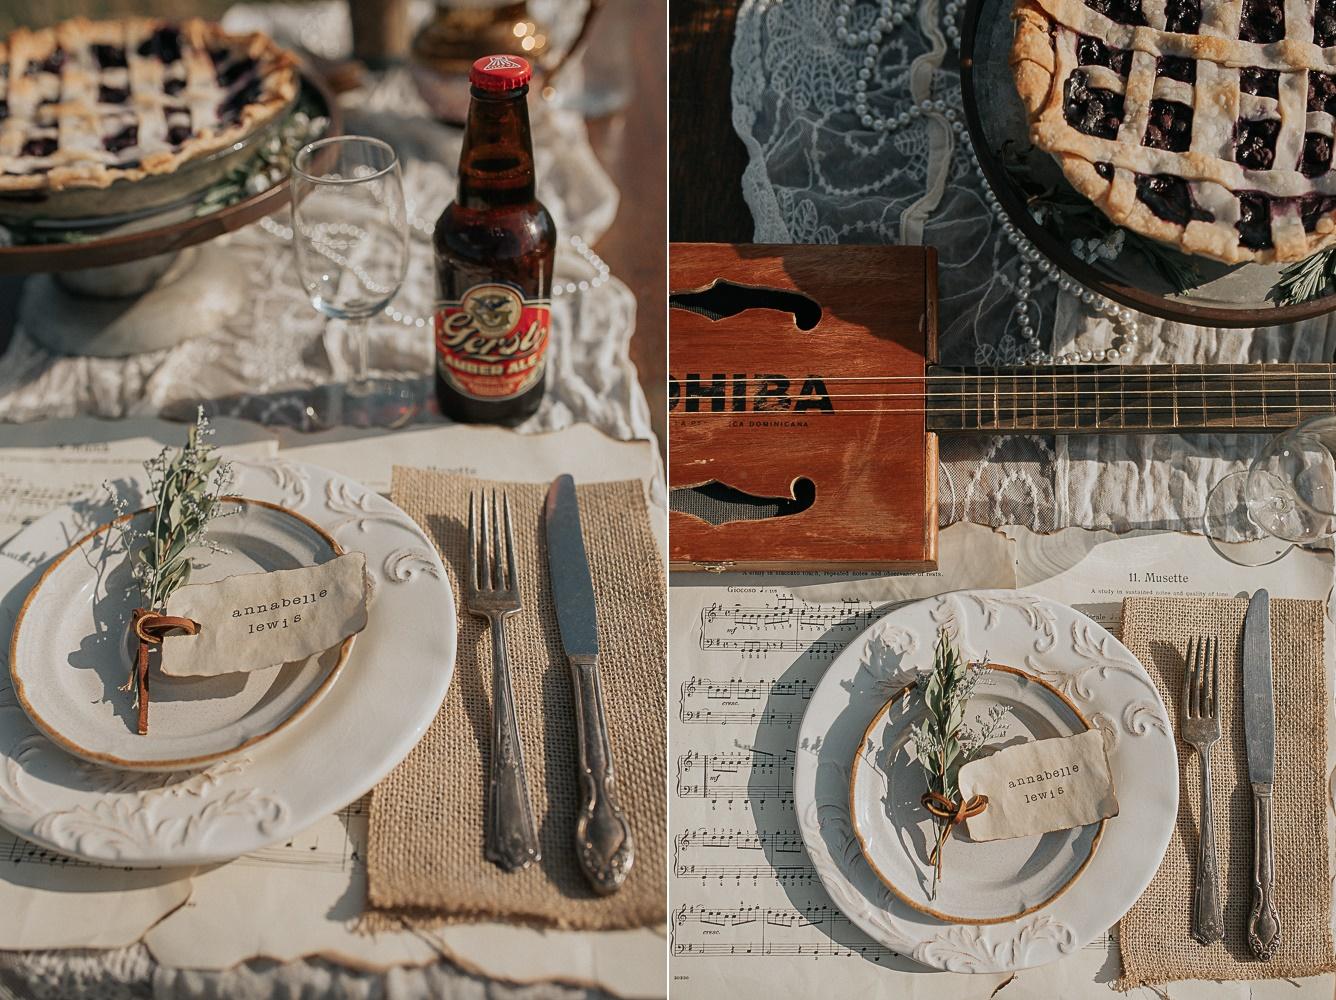 Cassie Cook Photography-Memphis TN-portrait and wedding photographer -6663-horz.jpg